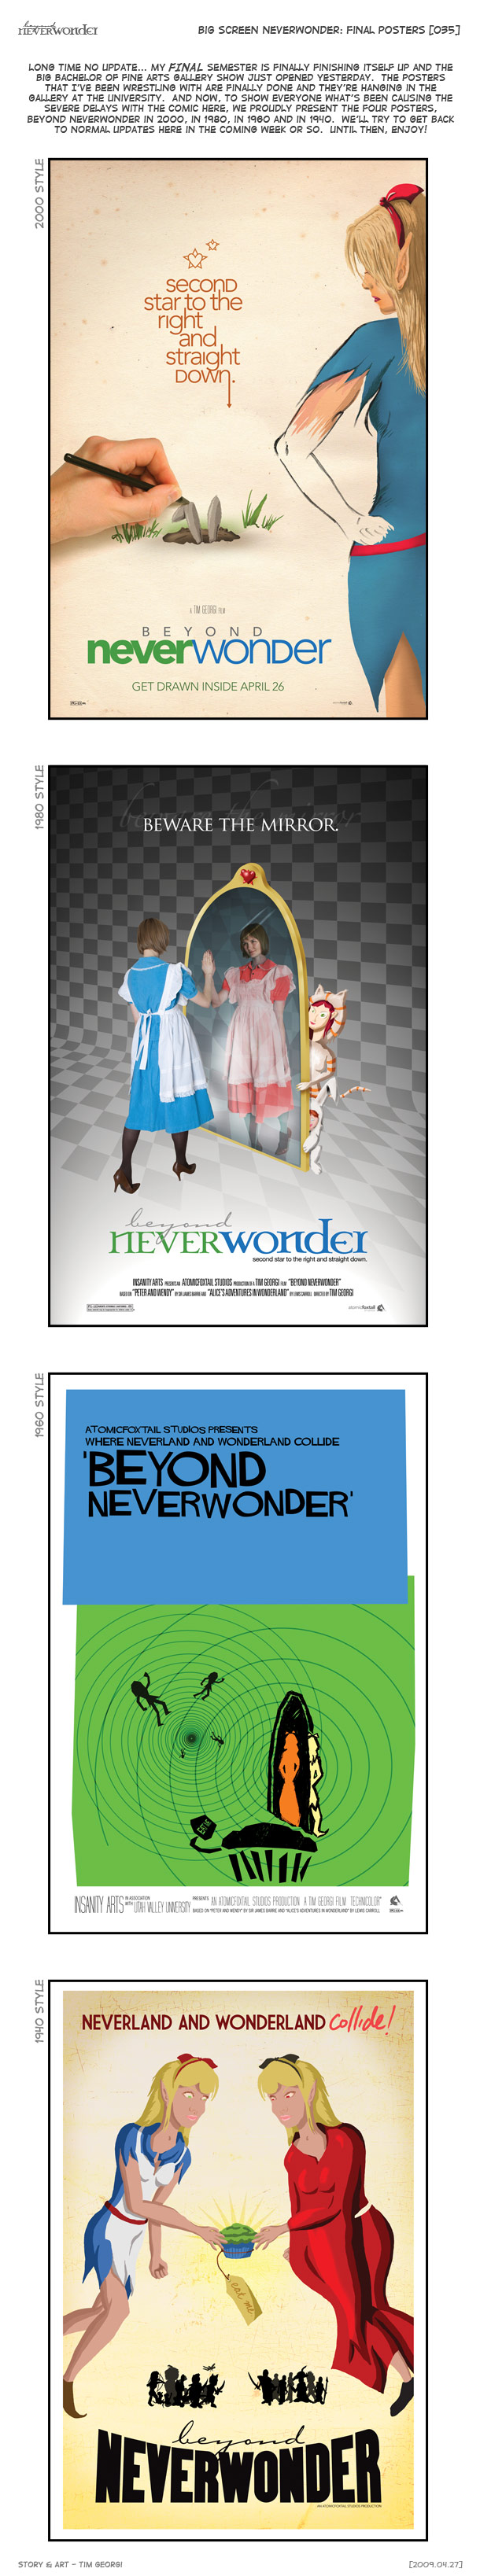 [035] Big Screen Neverwonder: Final Posters